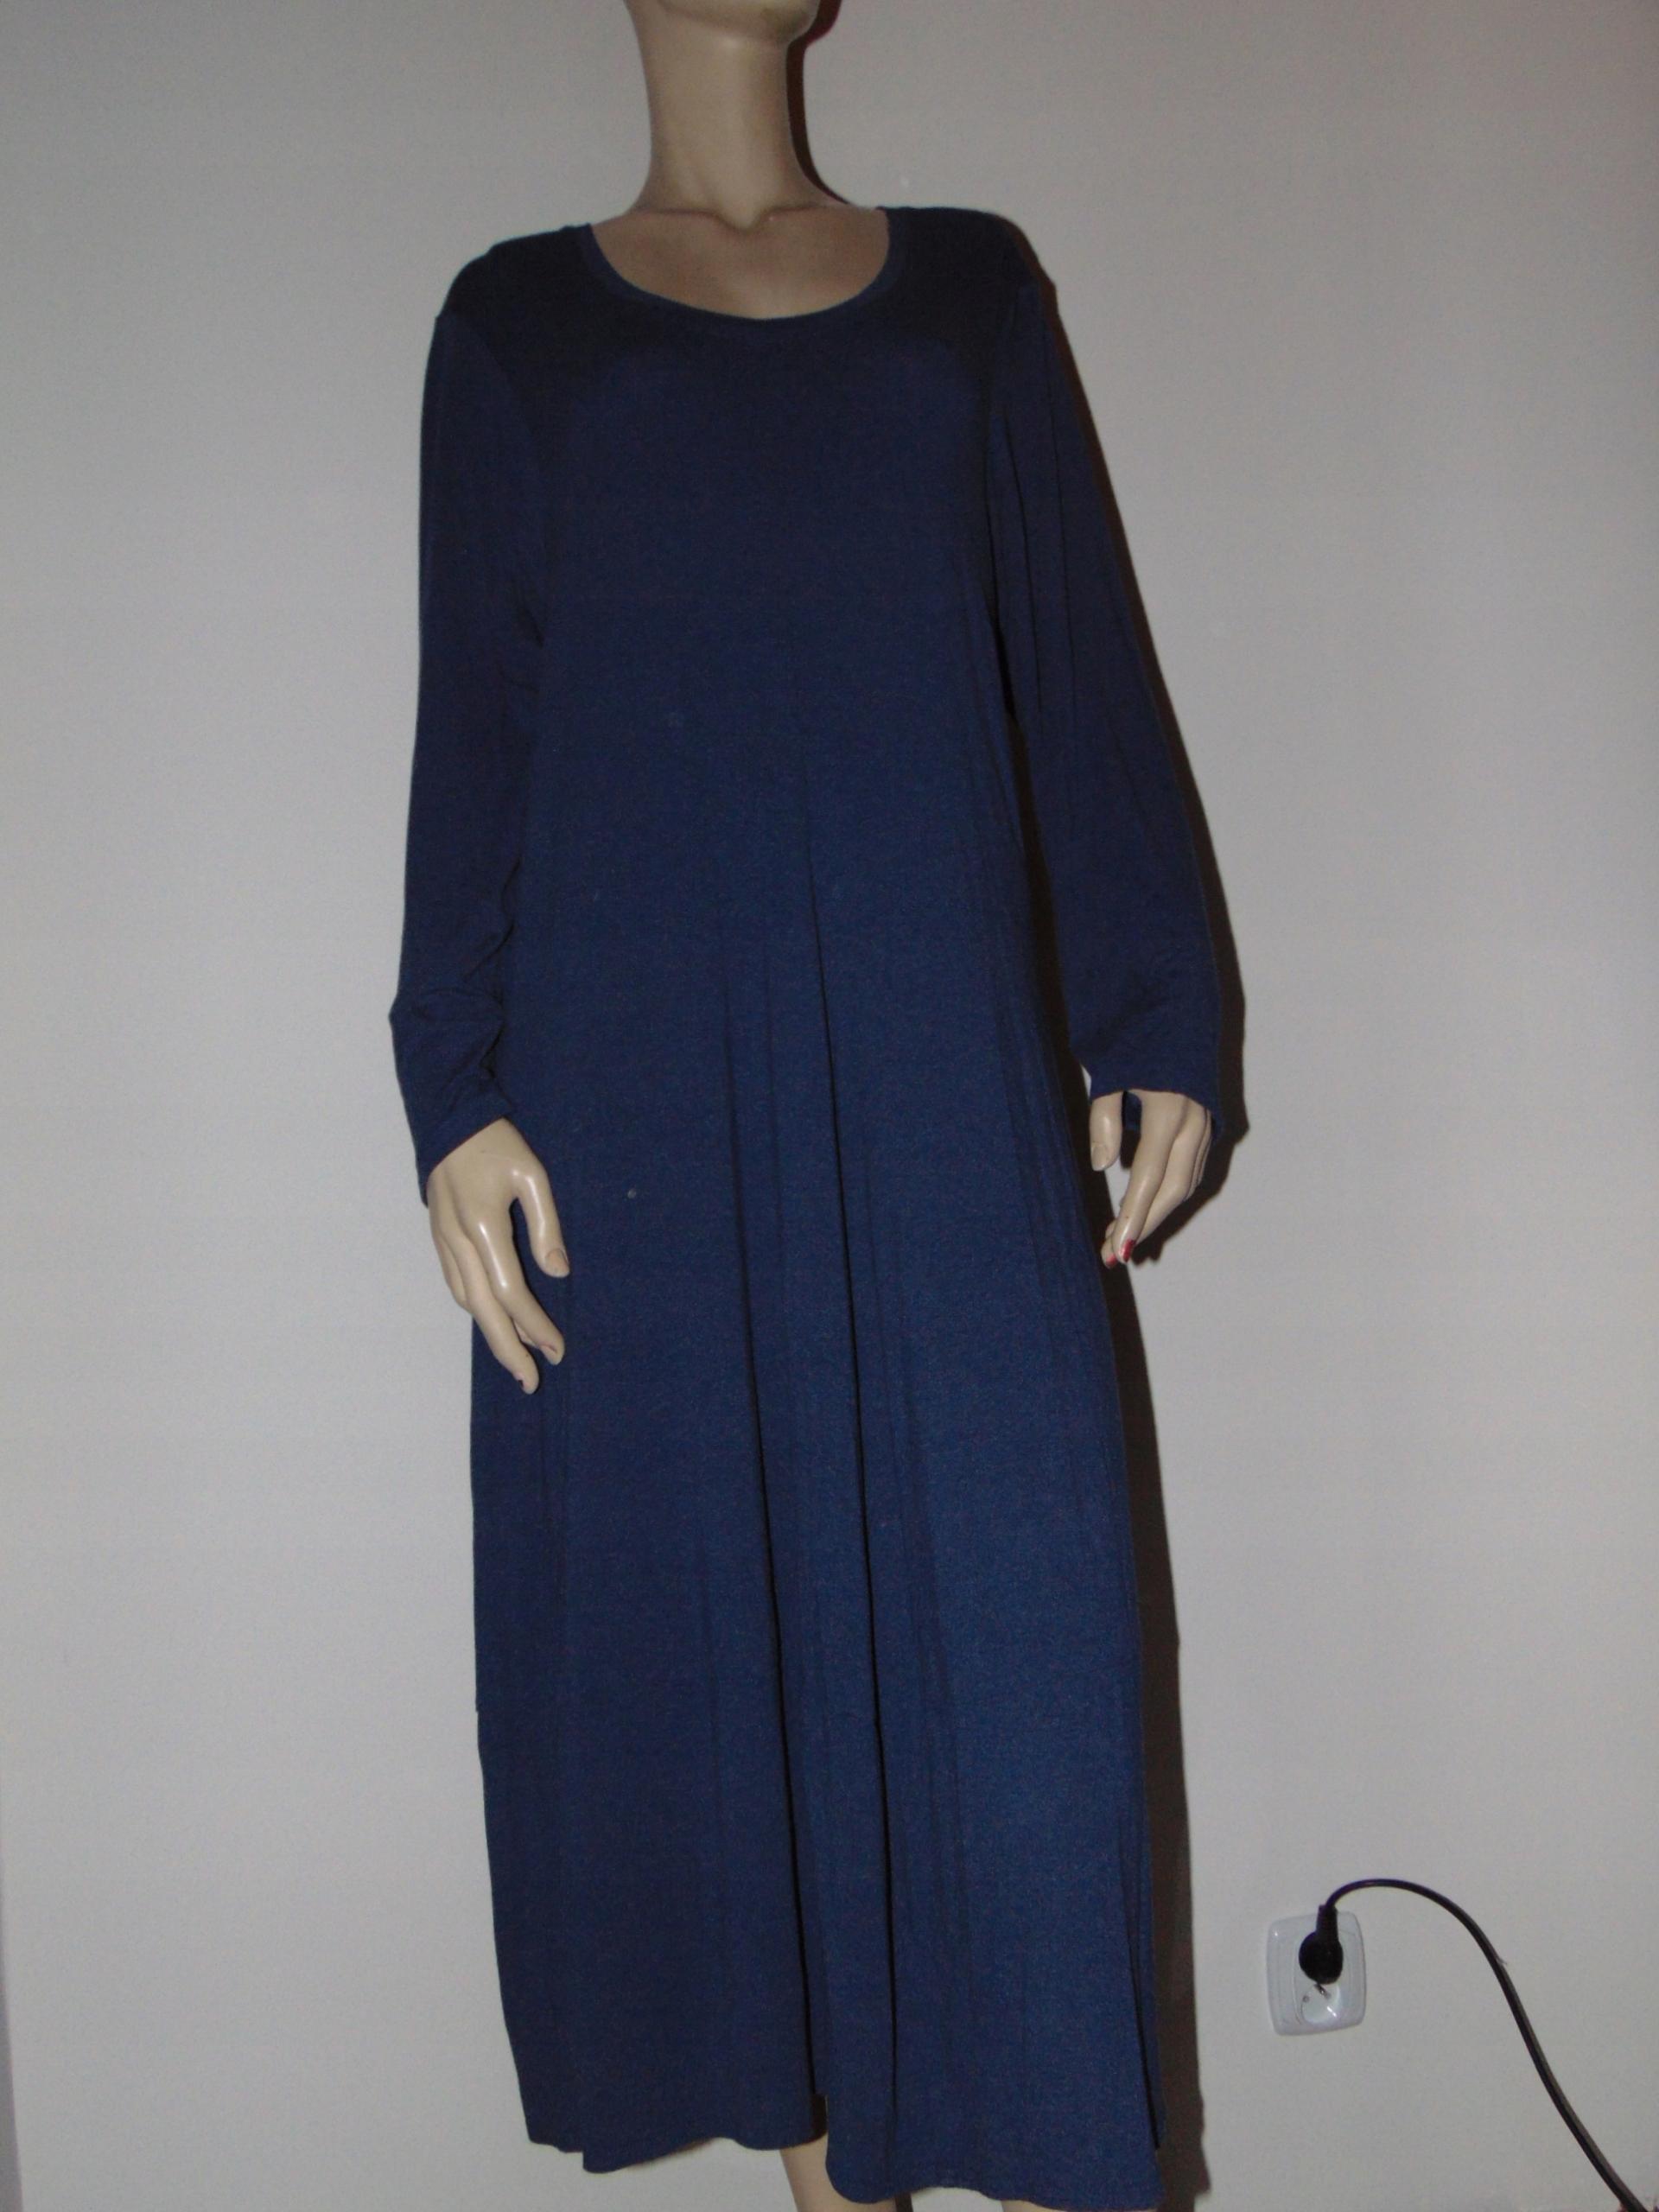 b094520bb7 Q NEEL Świetna sukienka damska roz 48 50 - 7737440596 - oficjalne ...